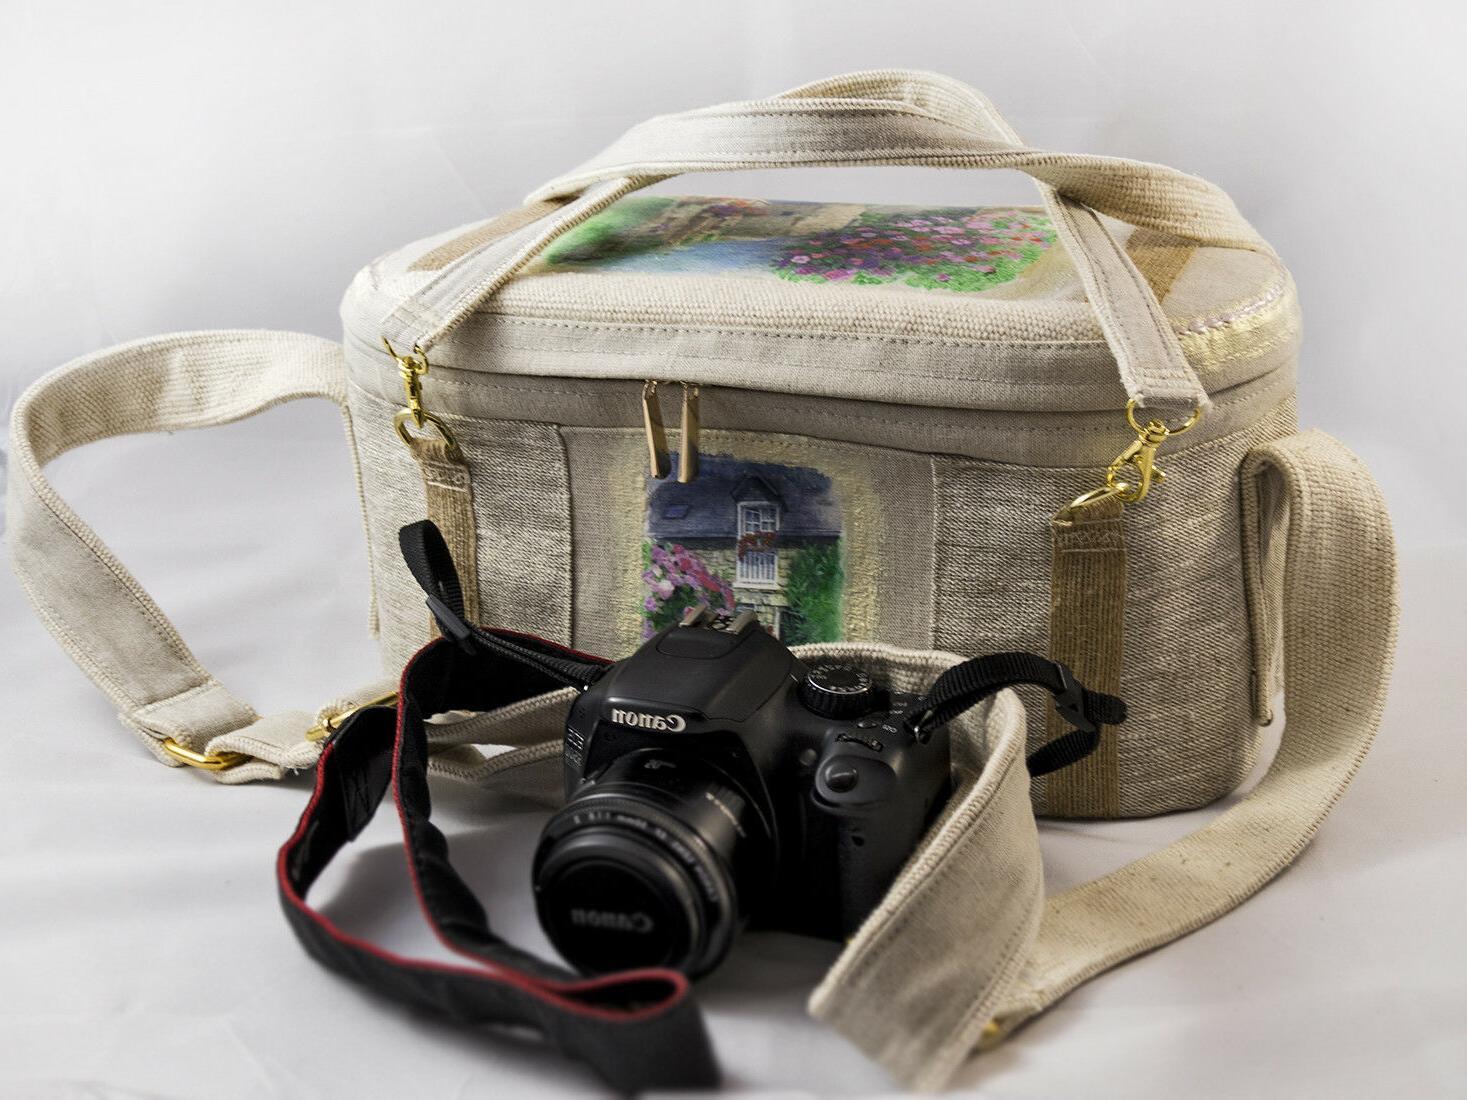 Handmade Dslr Camera Bag for Canon with insert Large OOAK